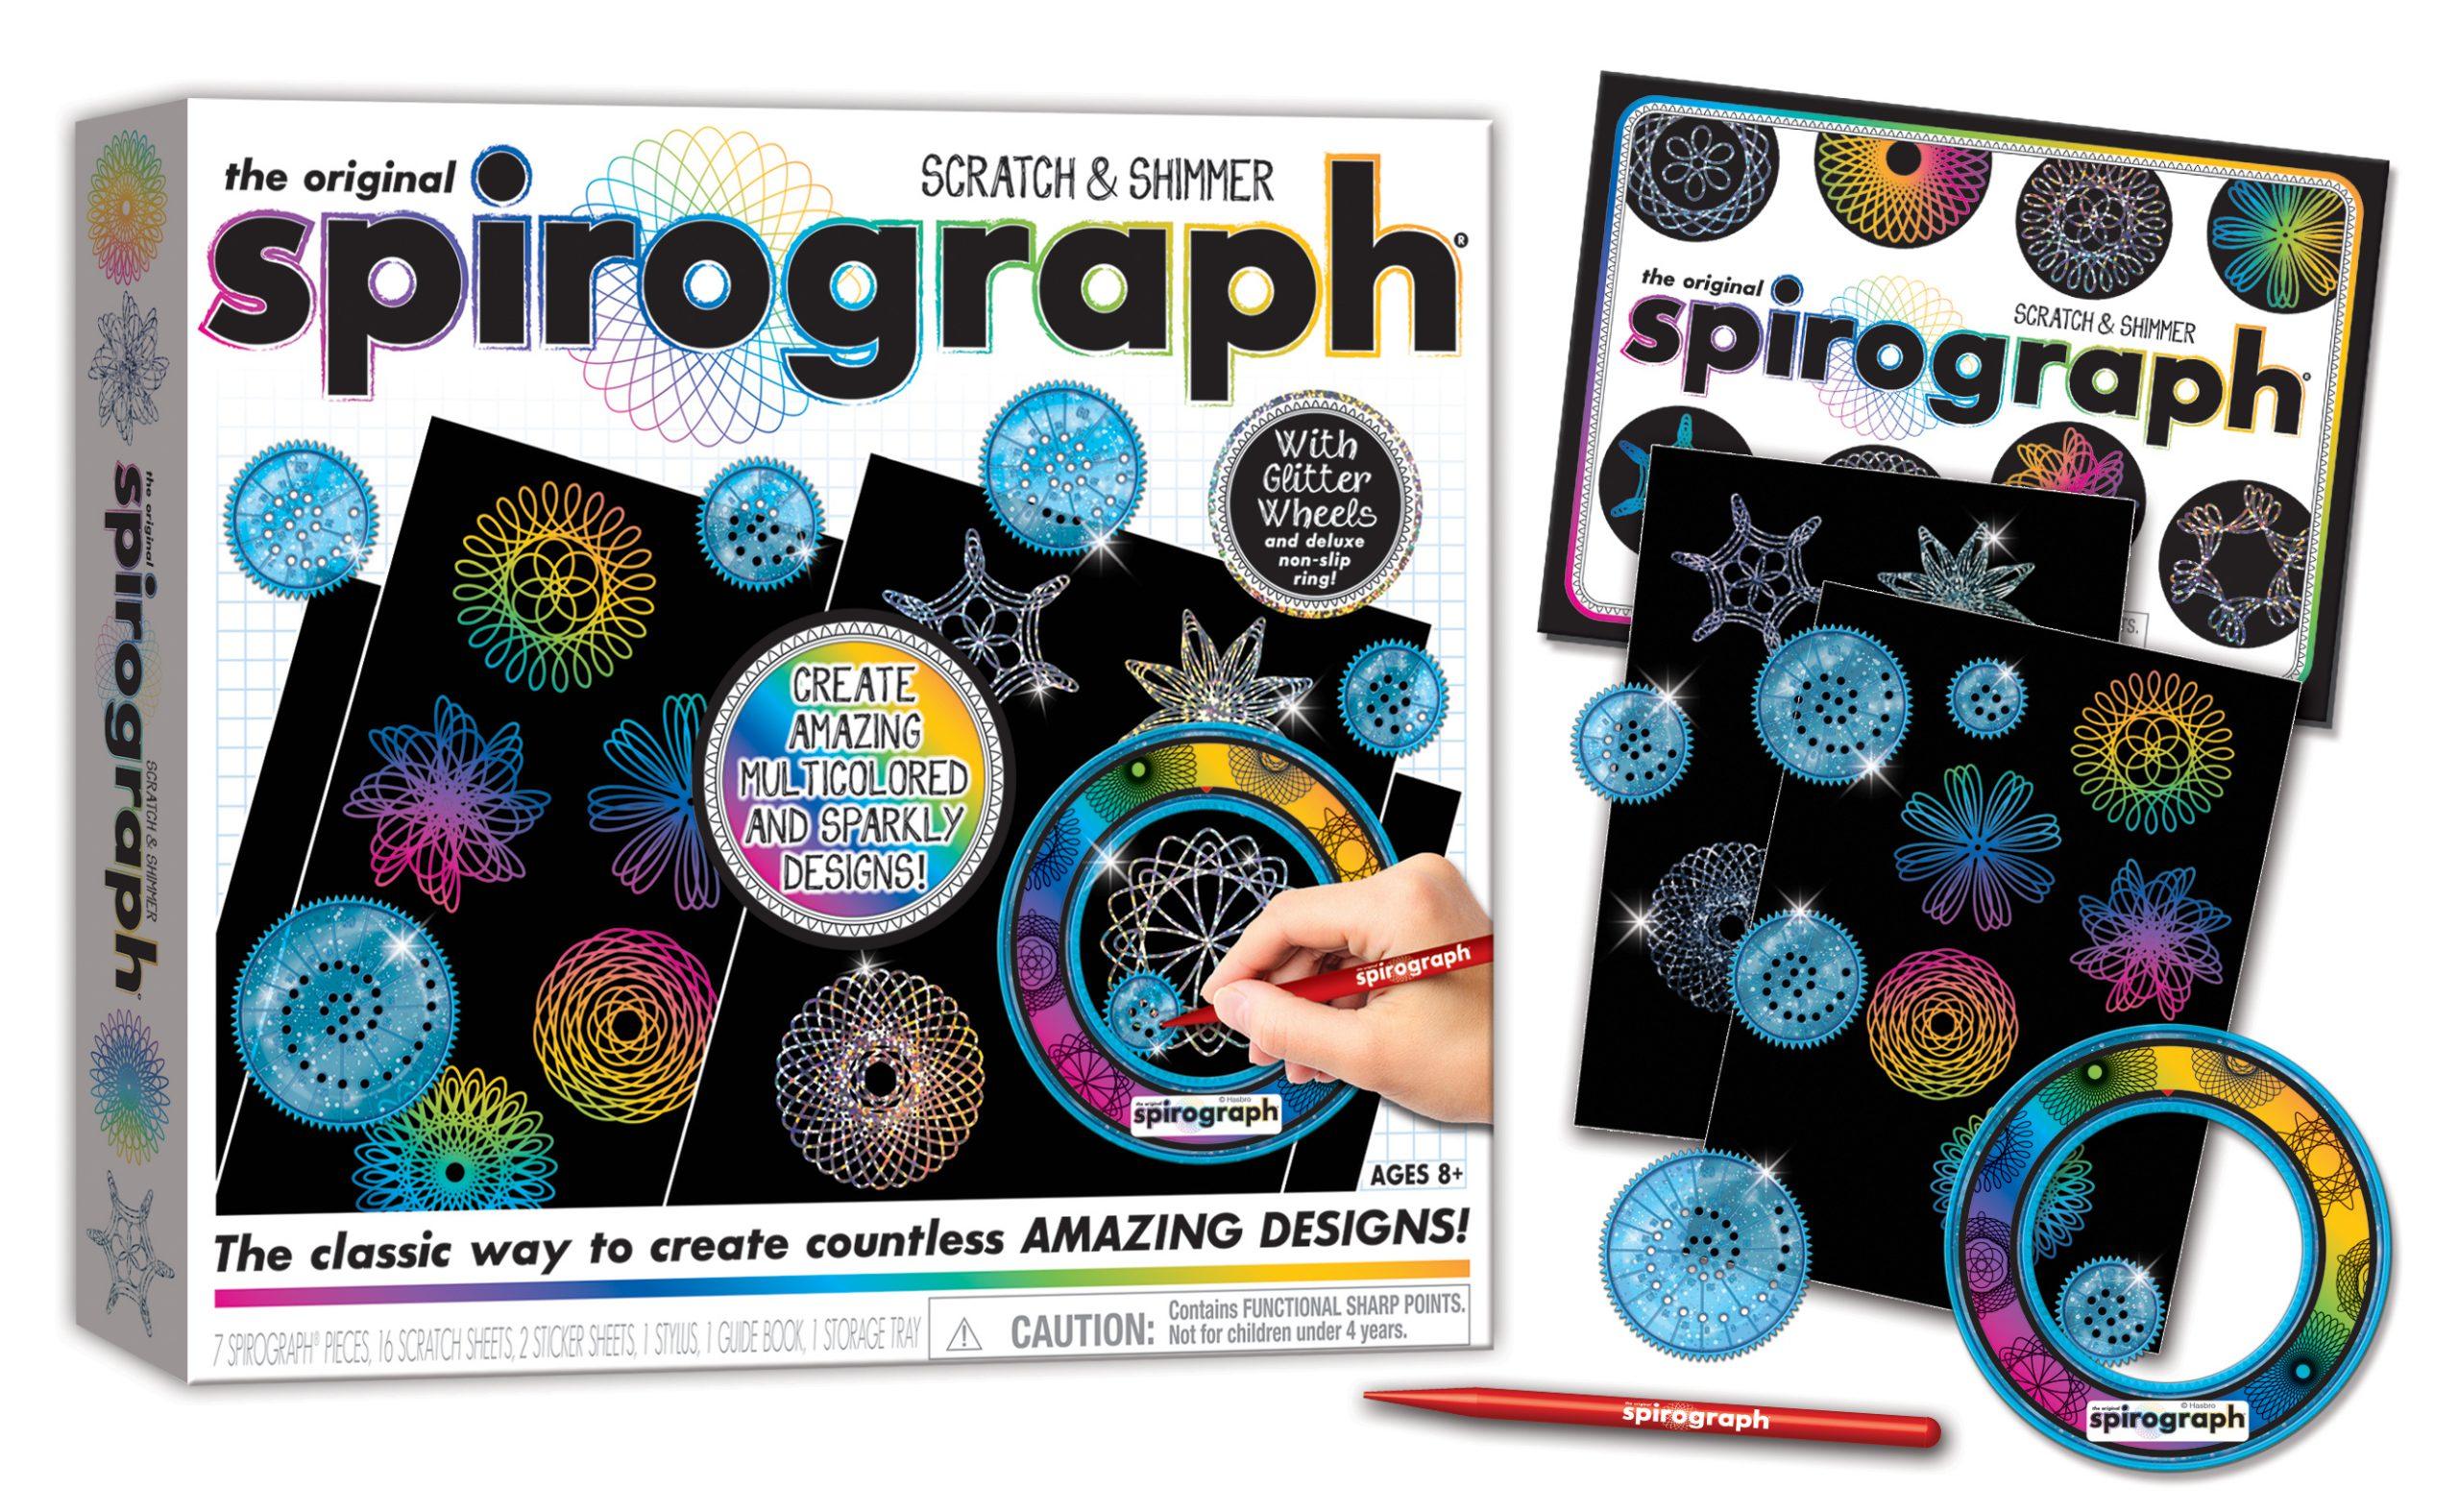 Spirograph Scratch & Shimmer